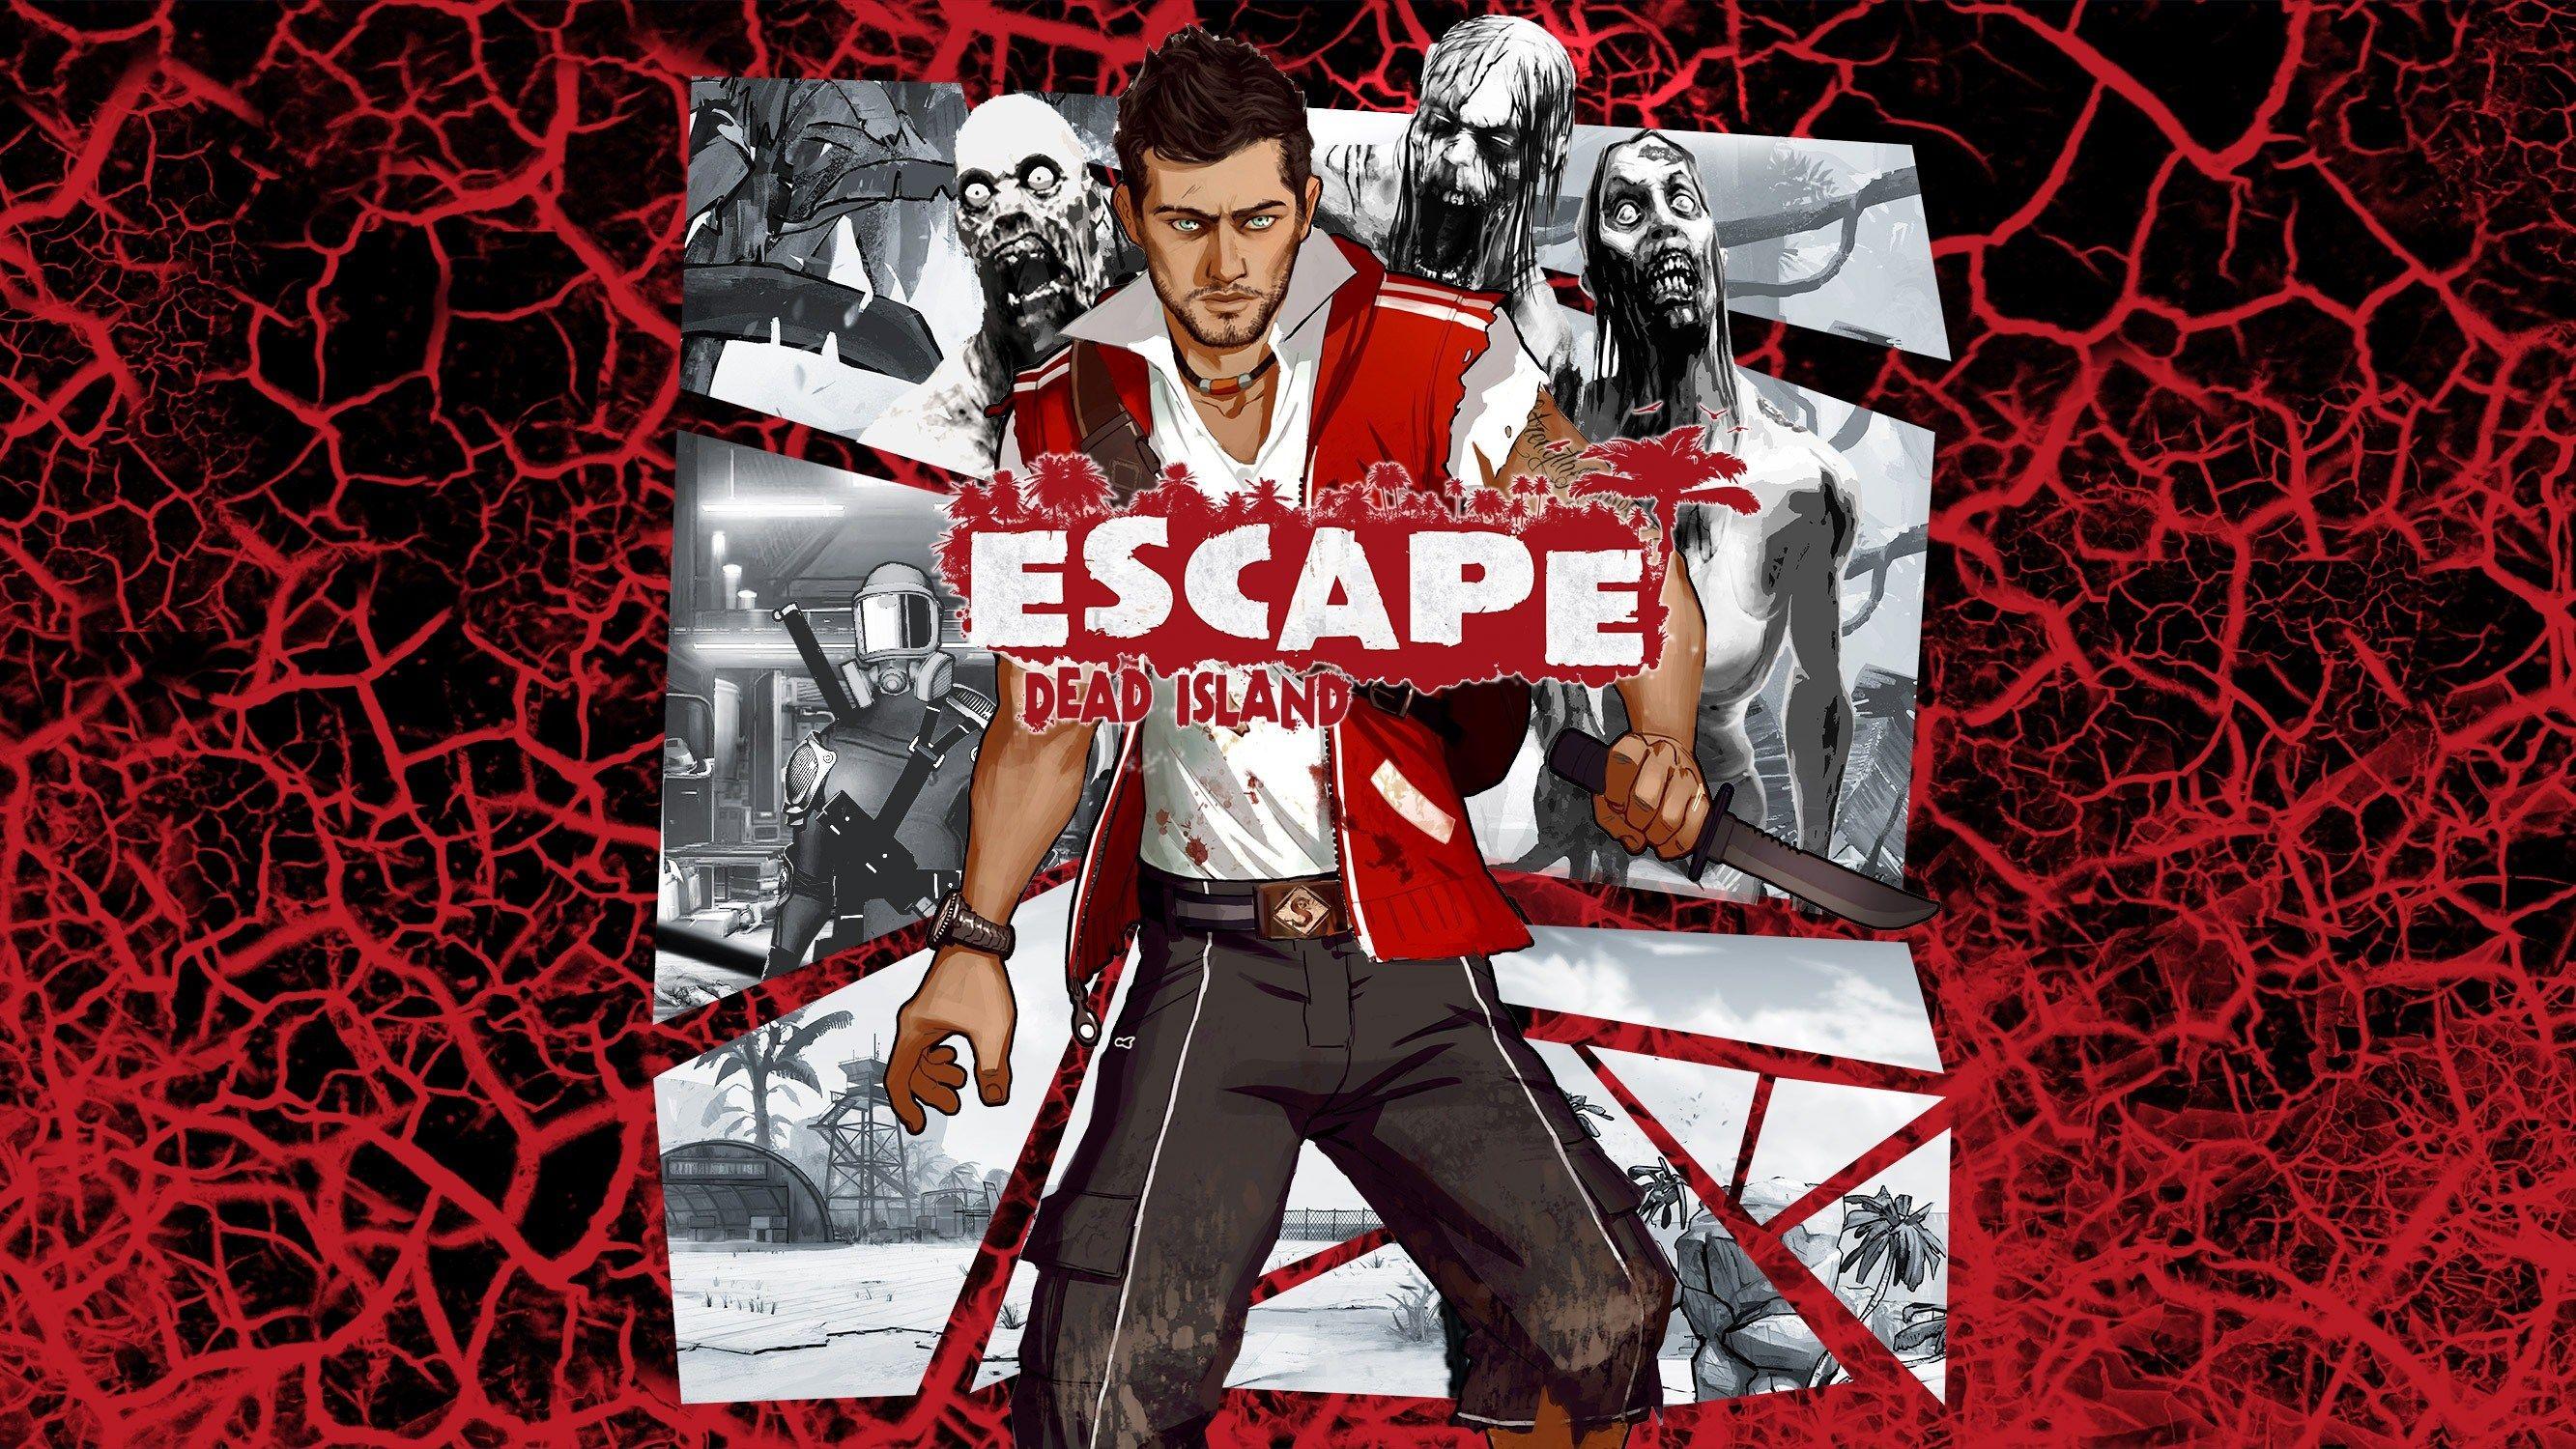 escape dead island free hd widescreen 2666x1500 Action